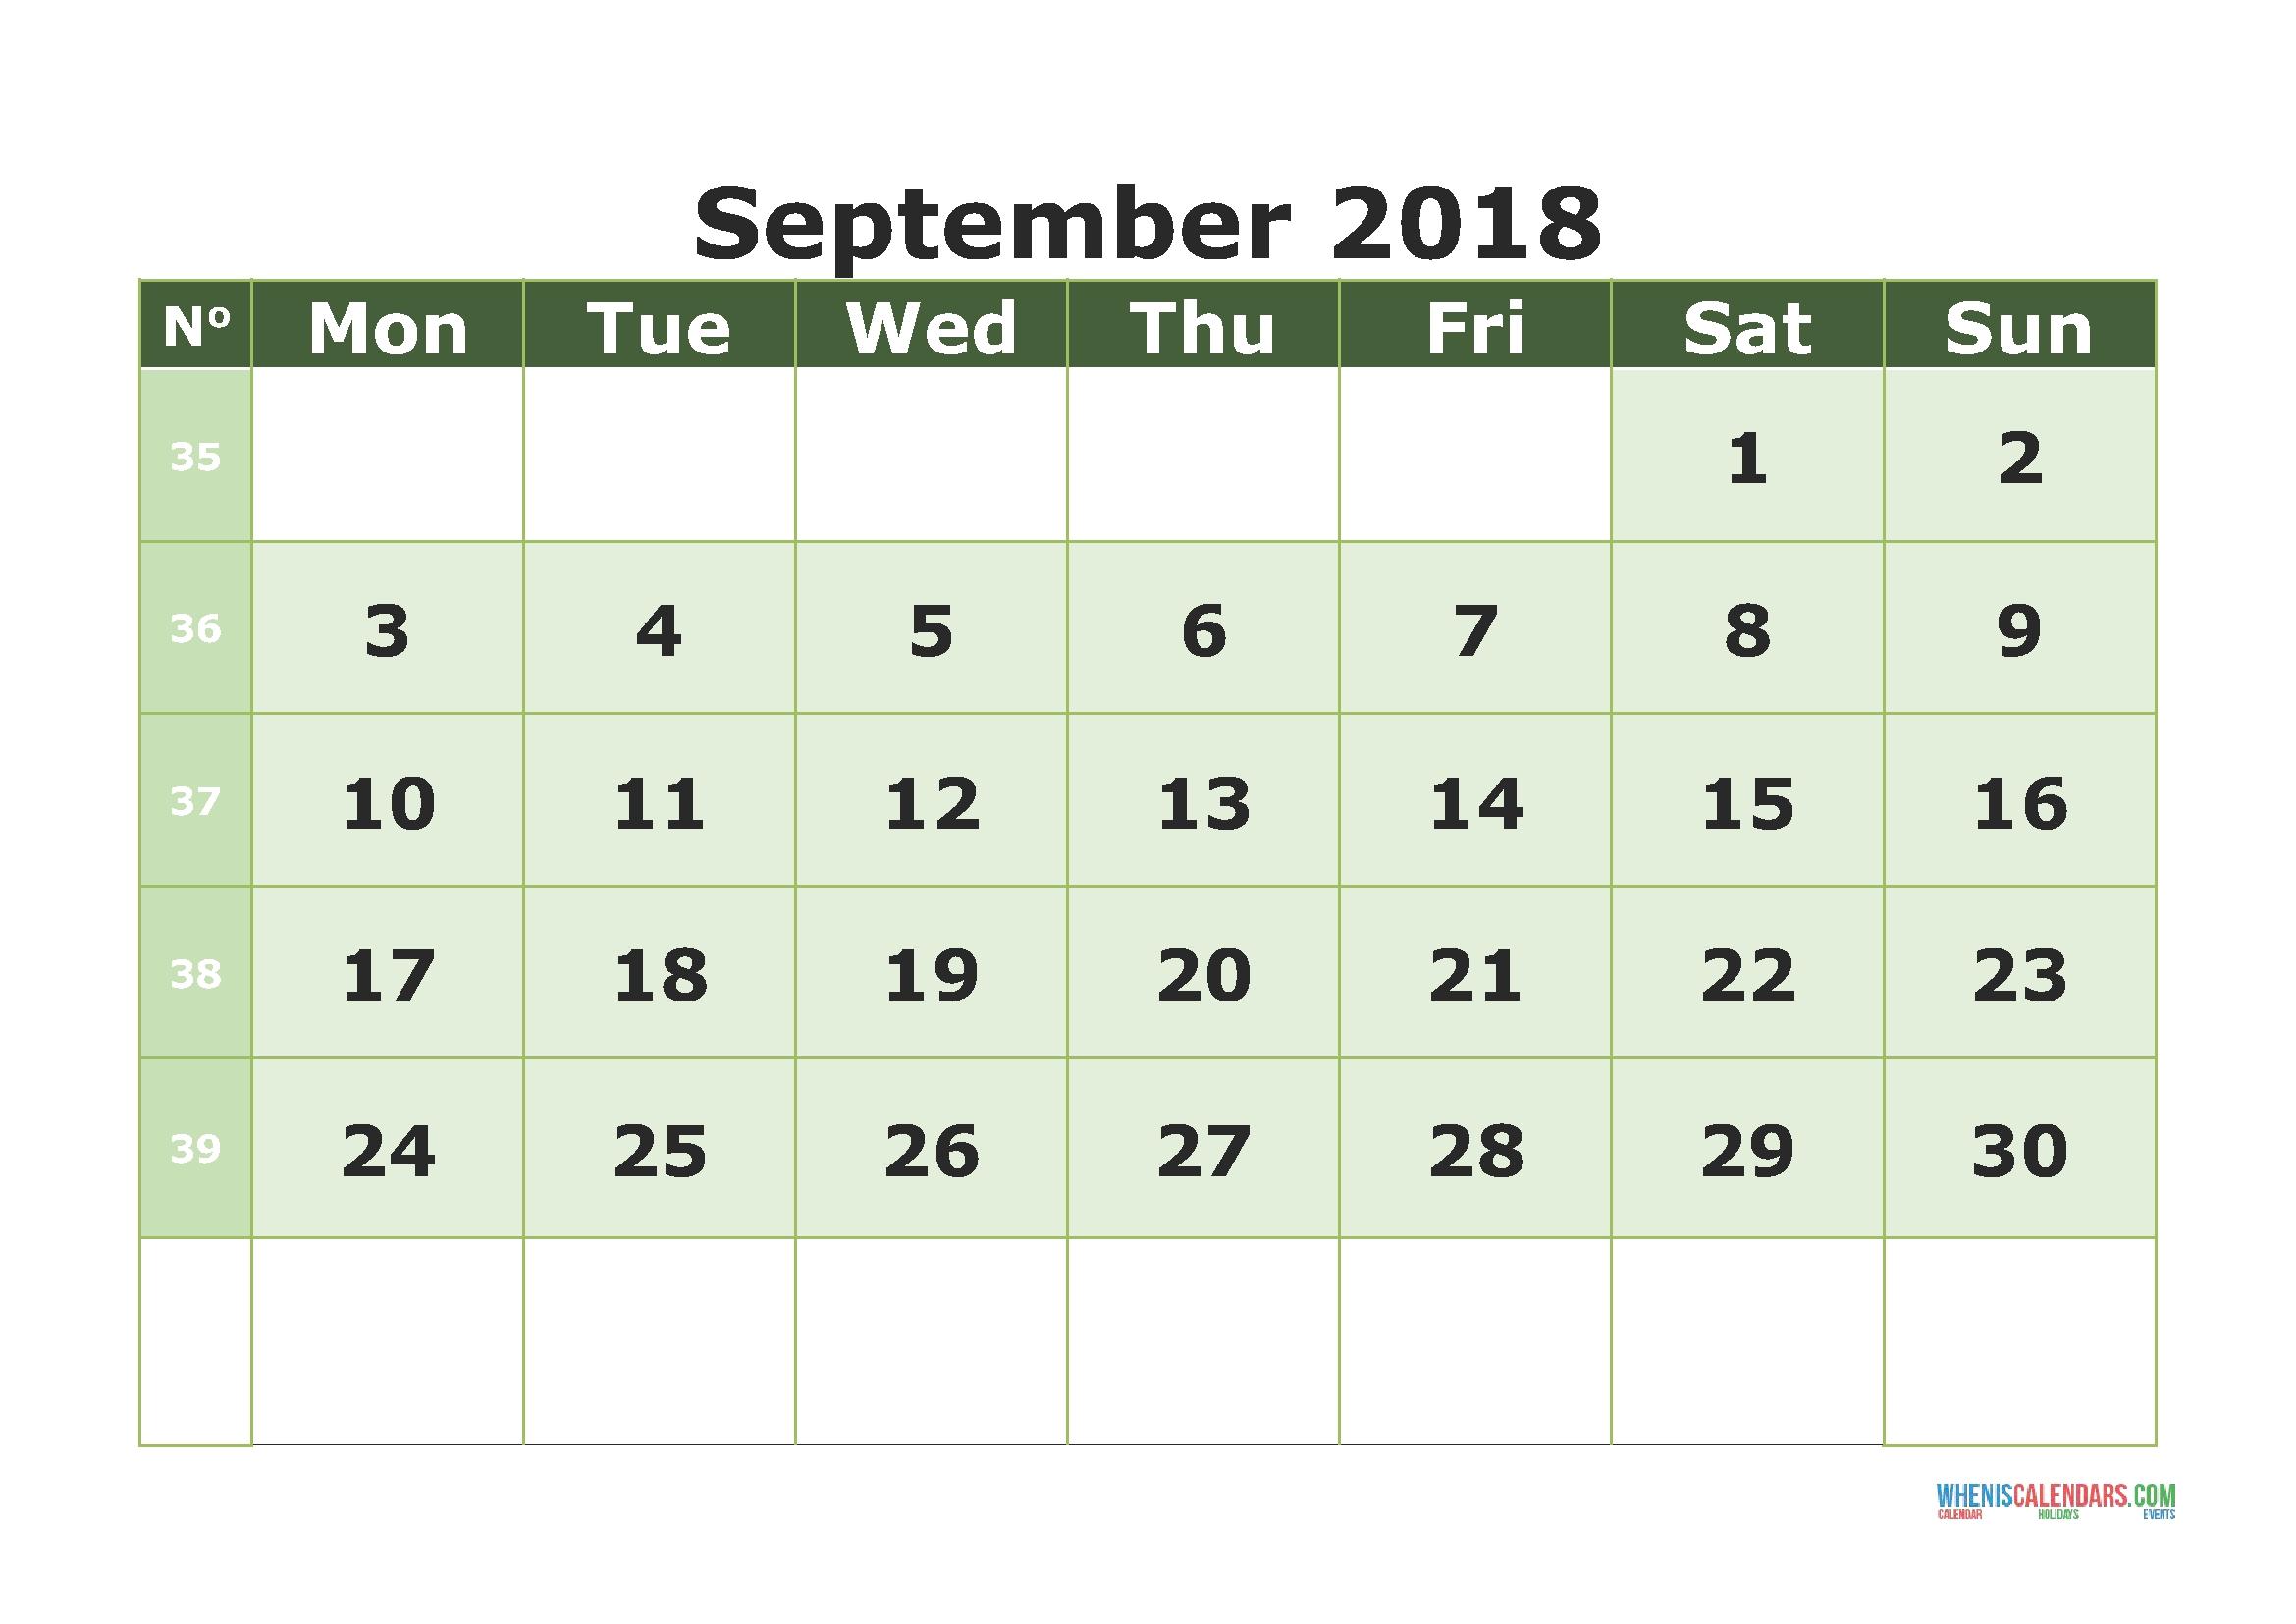 Printable Calendar September 2018 With Week Numbers (Monday